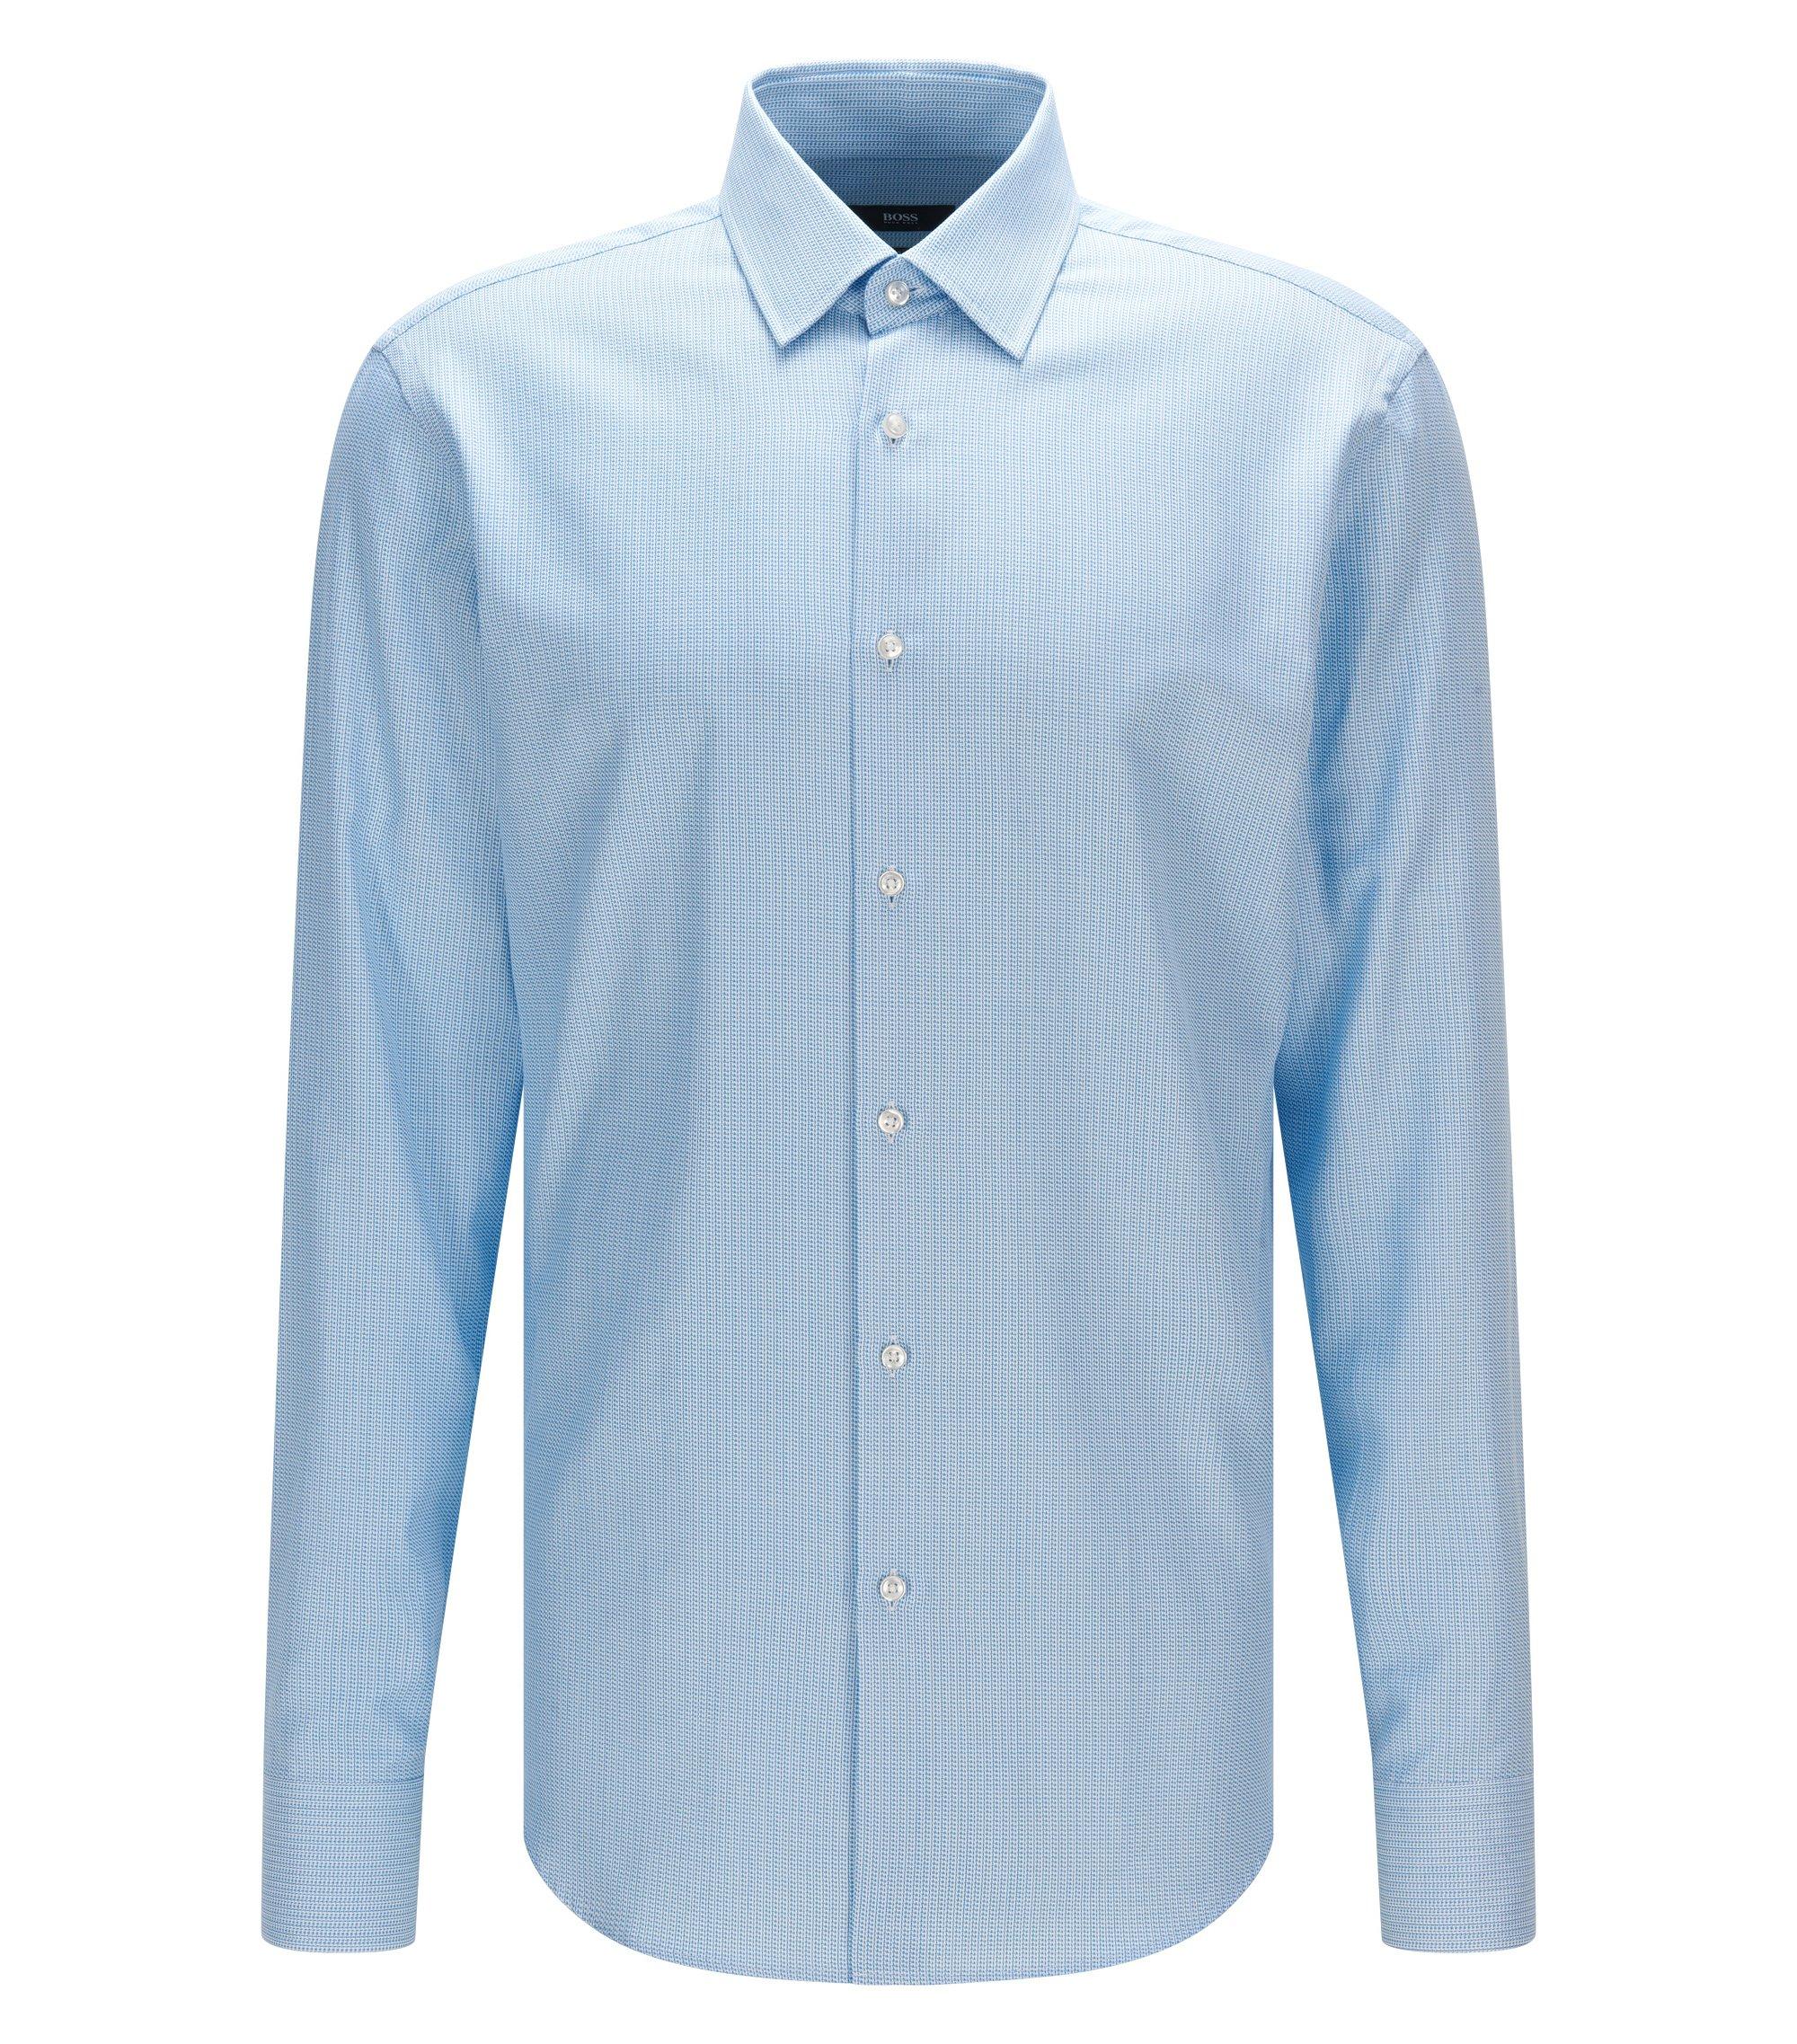 Dobby Italian Cotton Dress Shirt, Regular fit | Enzo, Turquoise